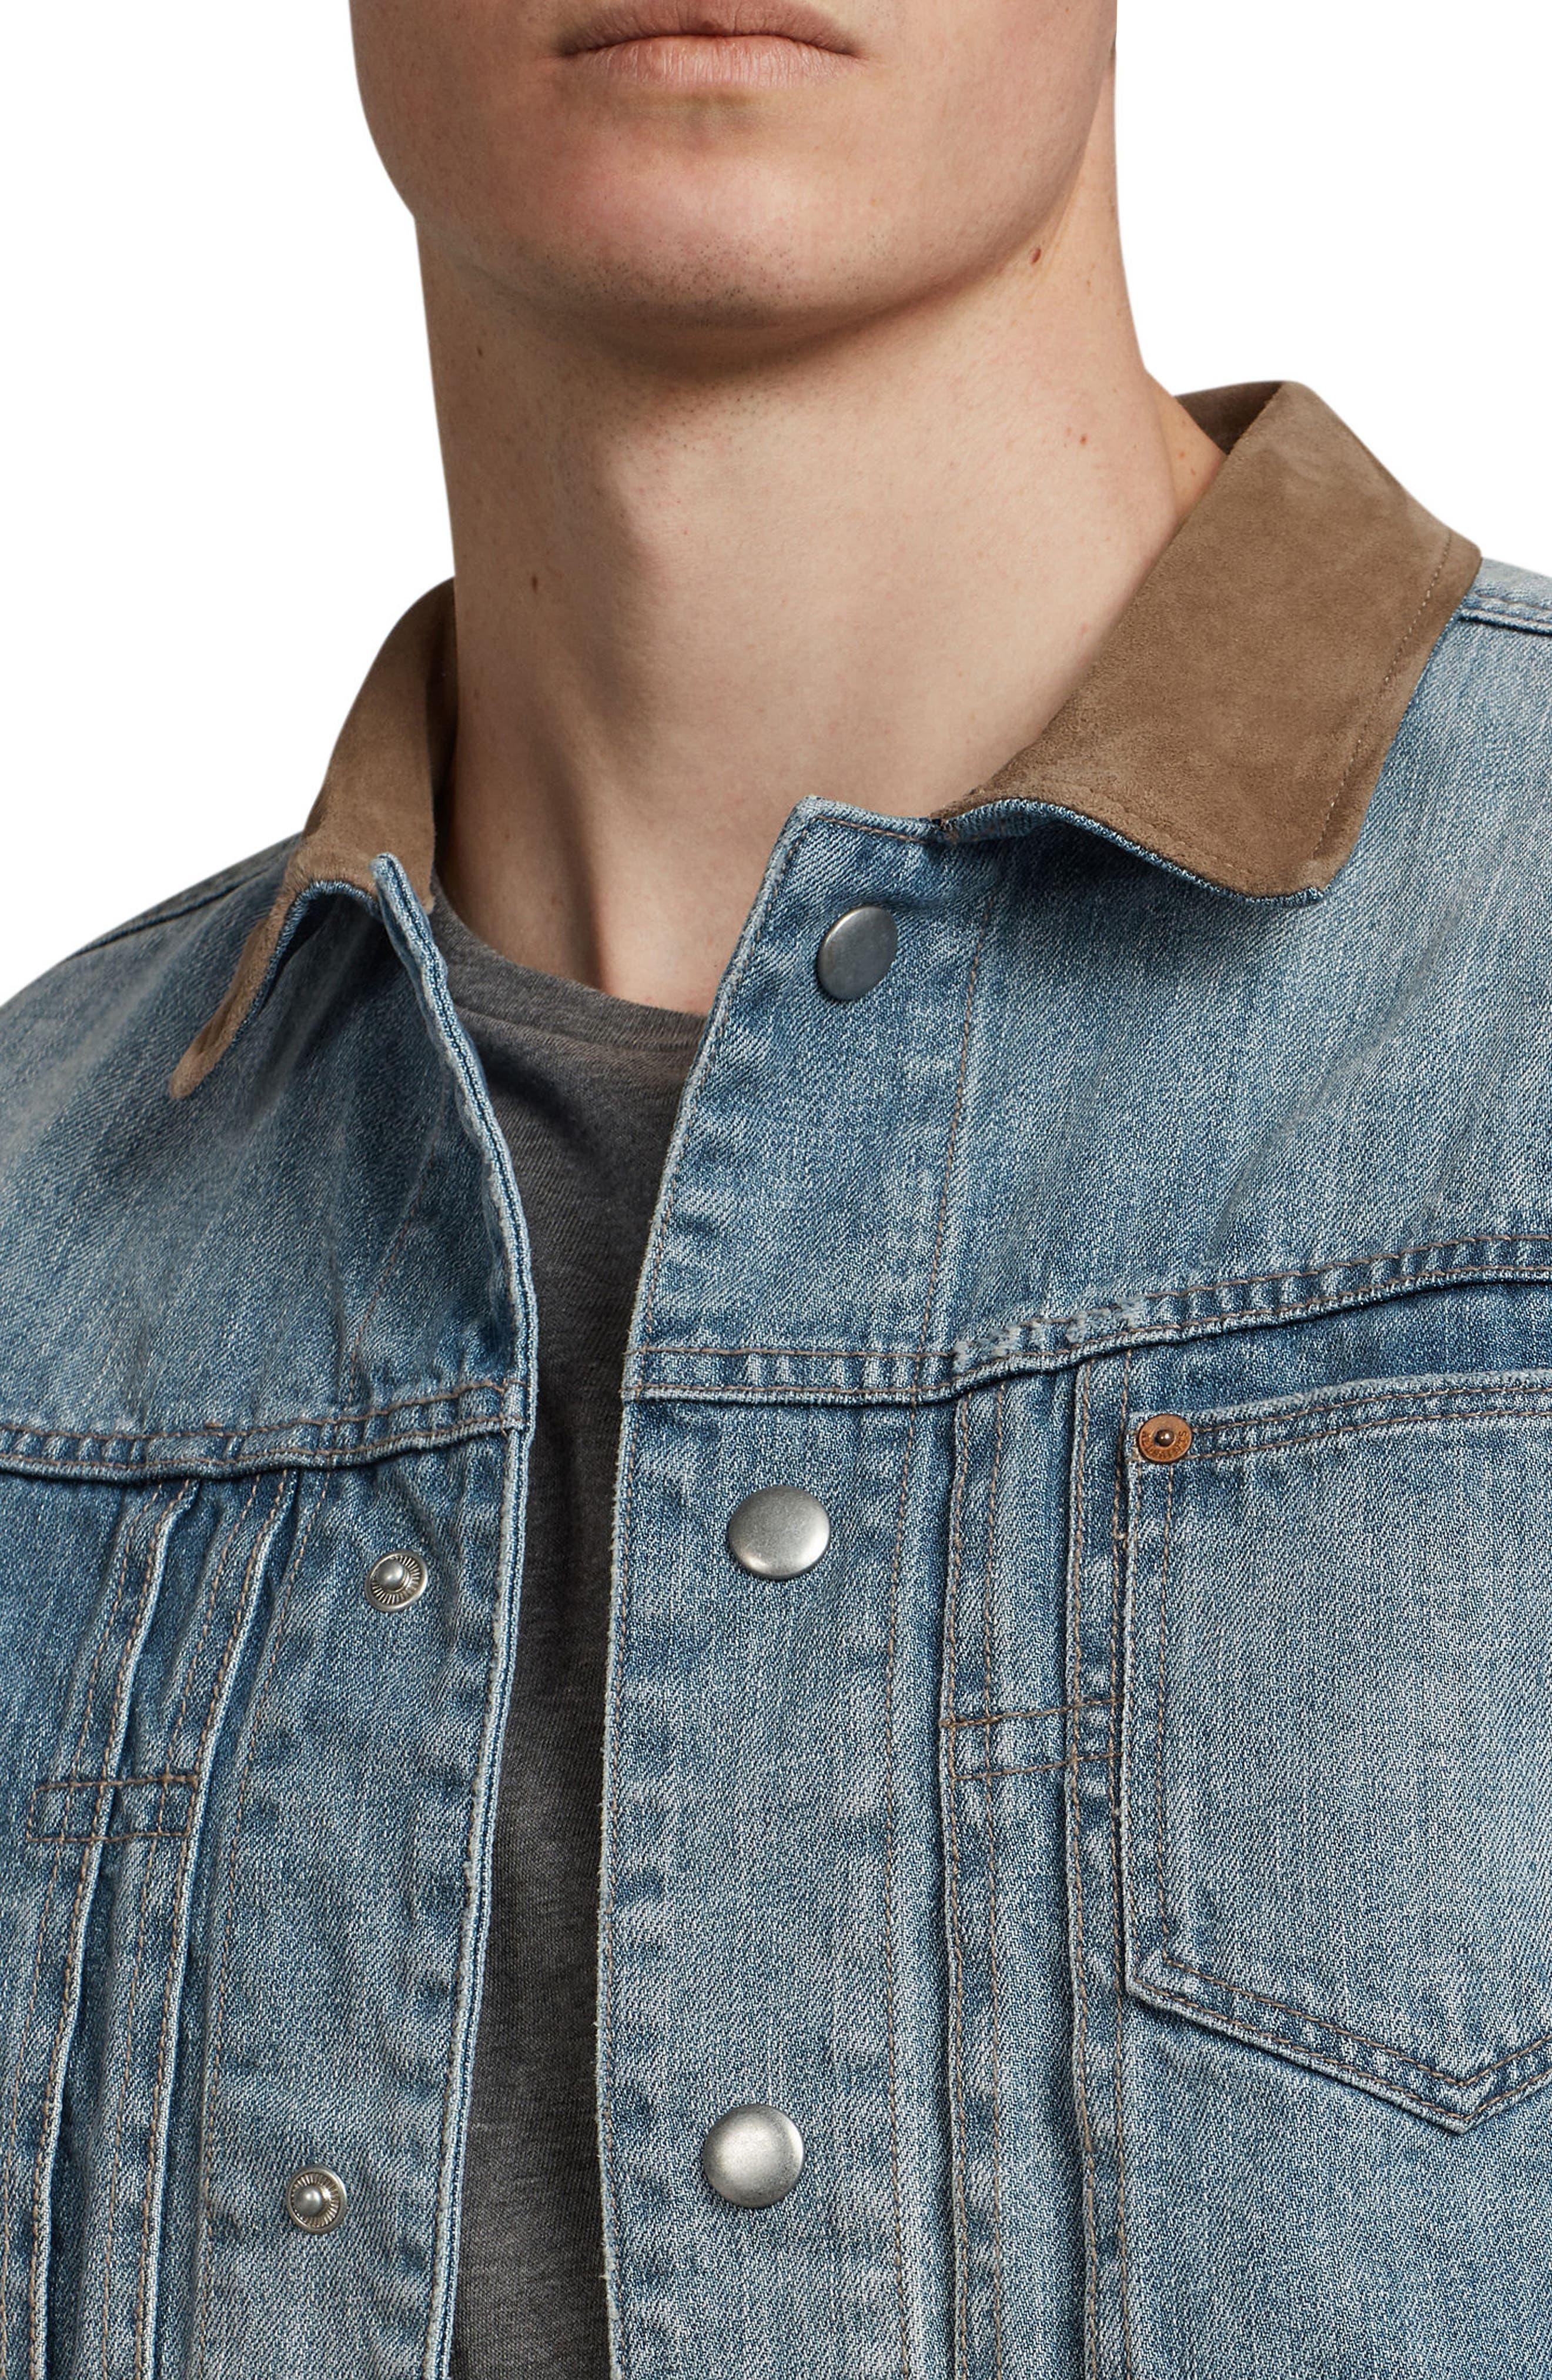 Ibanex Slim Fit Distressed Denim Jacket,                             Alternate thumbnail 4, color,                             460